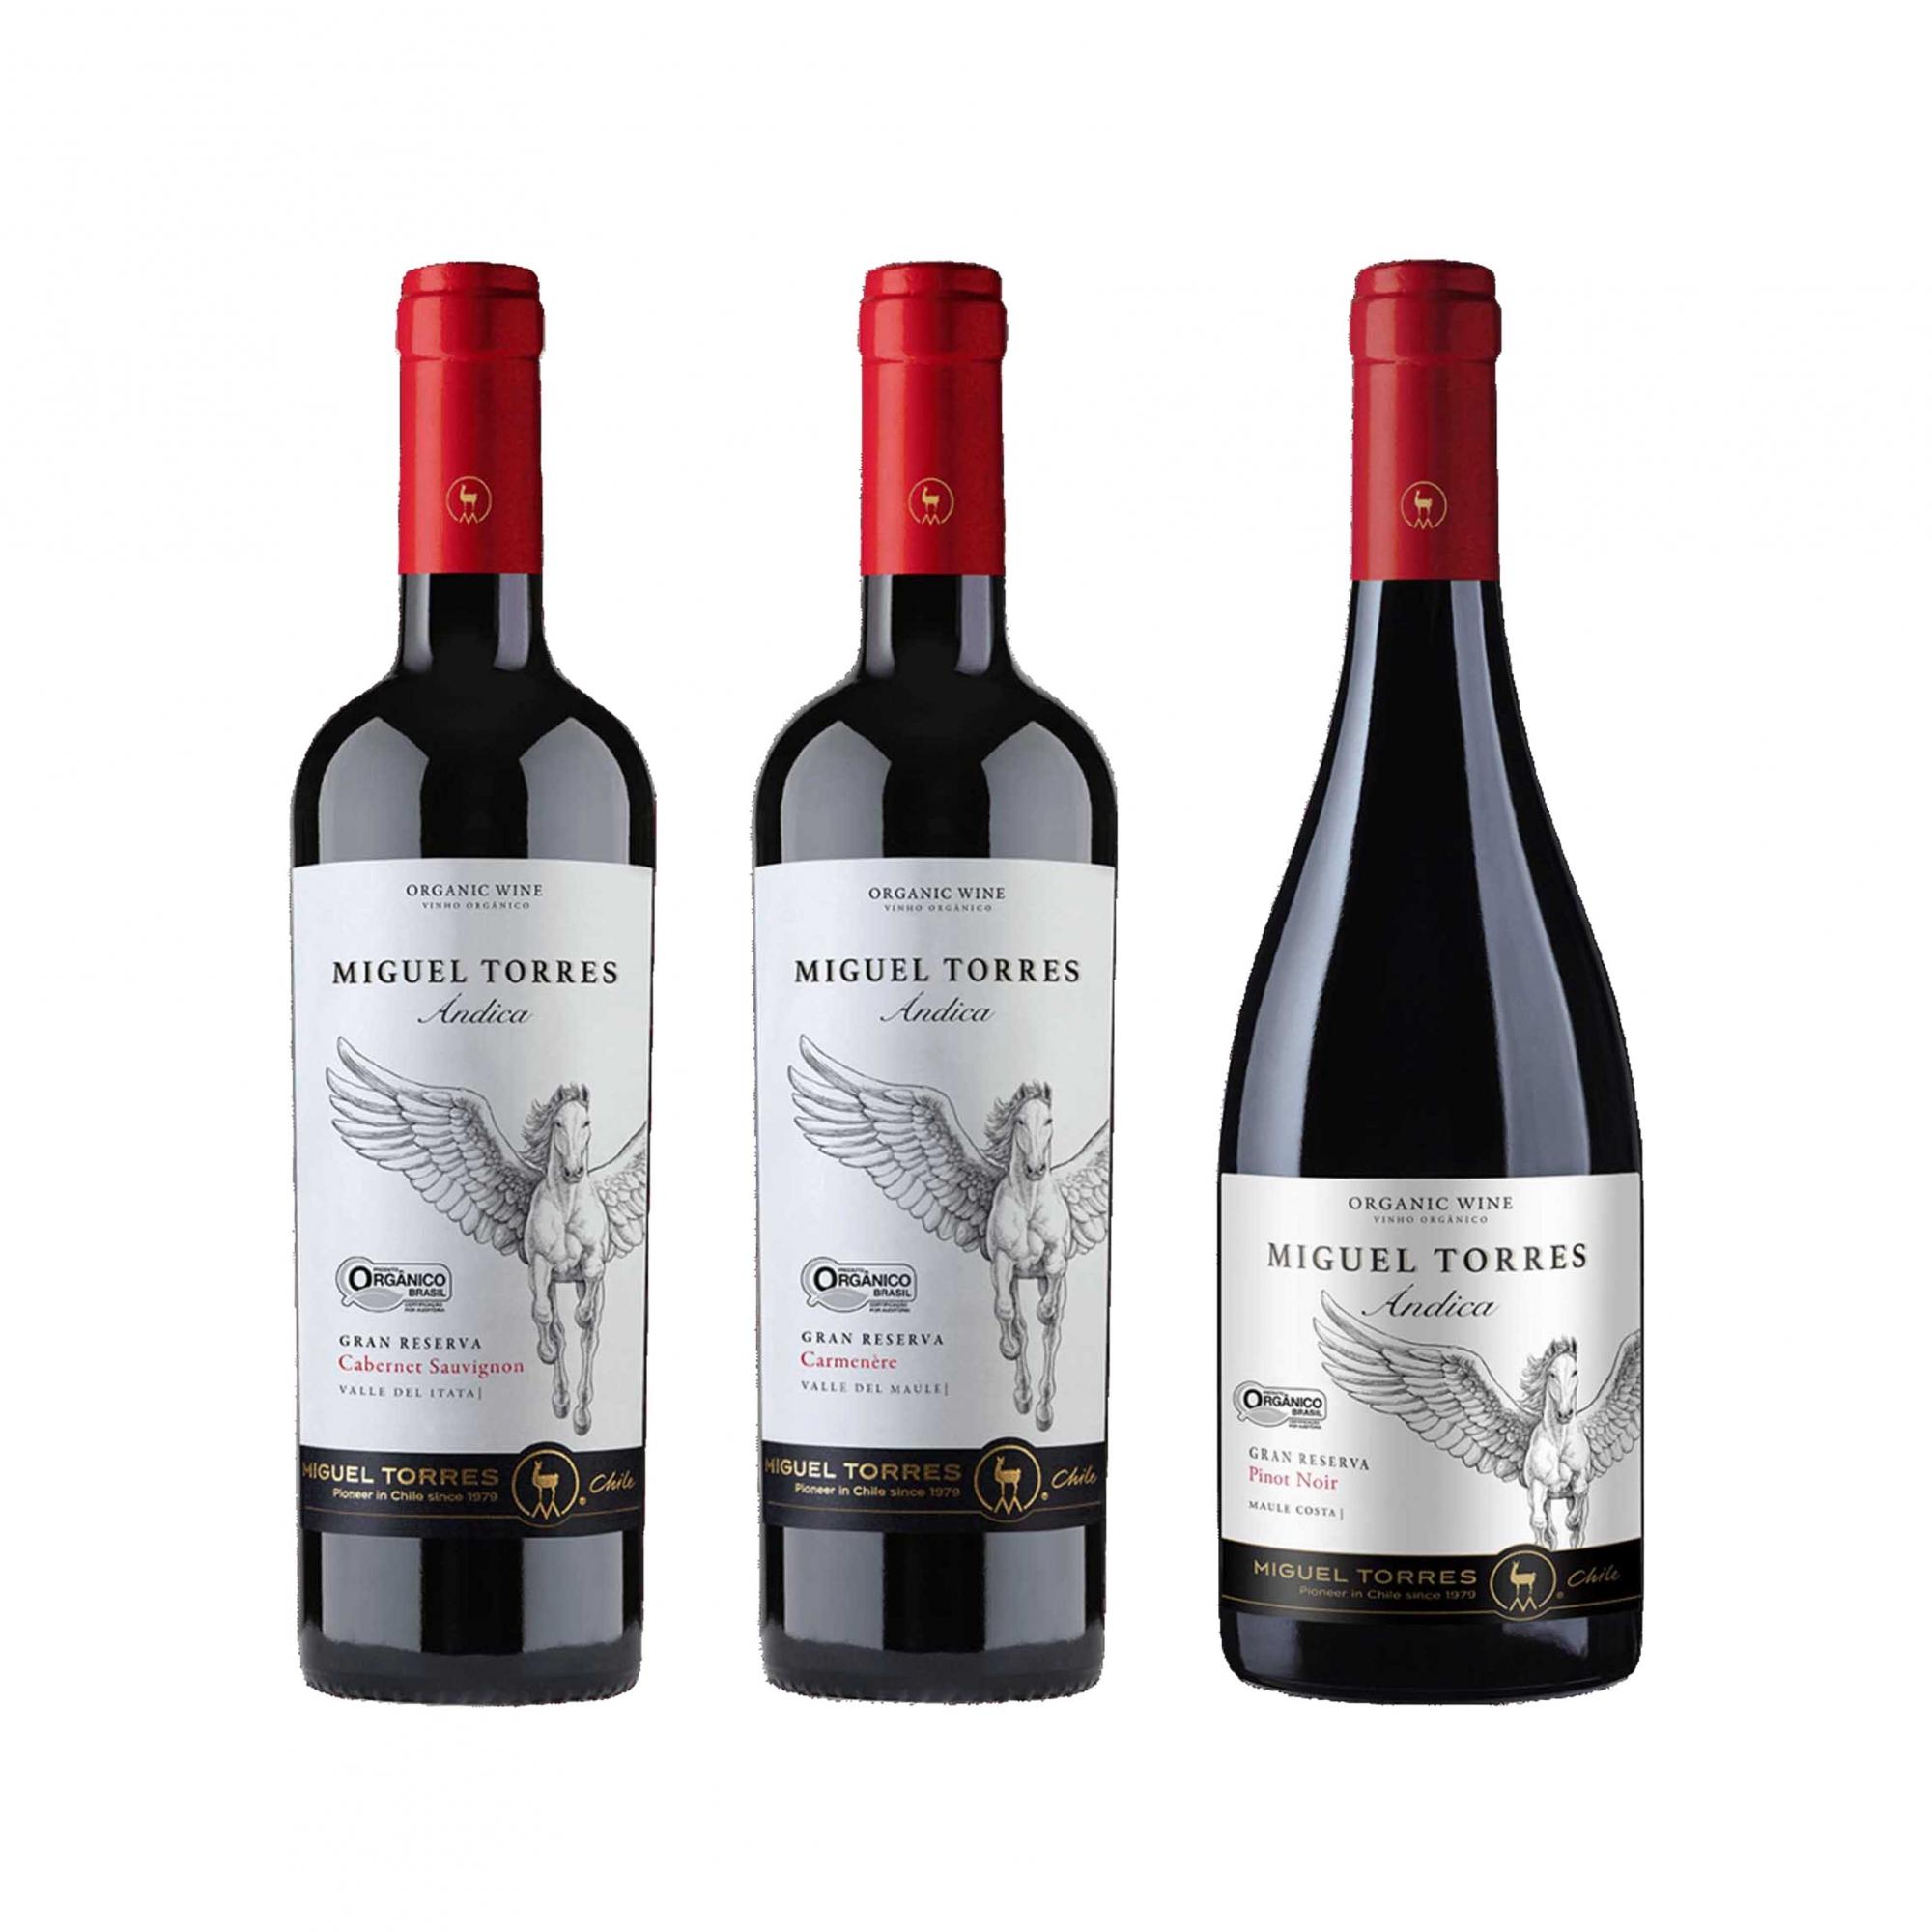 Kit 3x Vinho Tinto Chileno Orgânico Miguel Torres Cabernet Sauvignon, Carmenere e Pinot Noir 2019